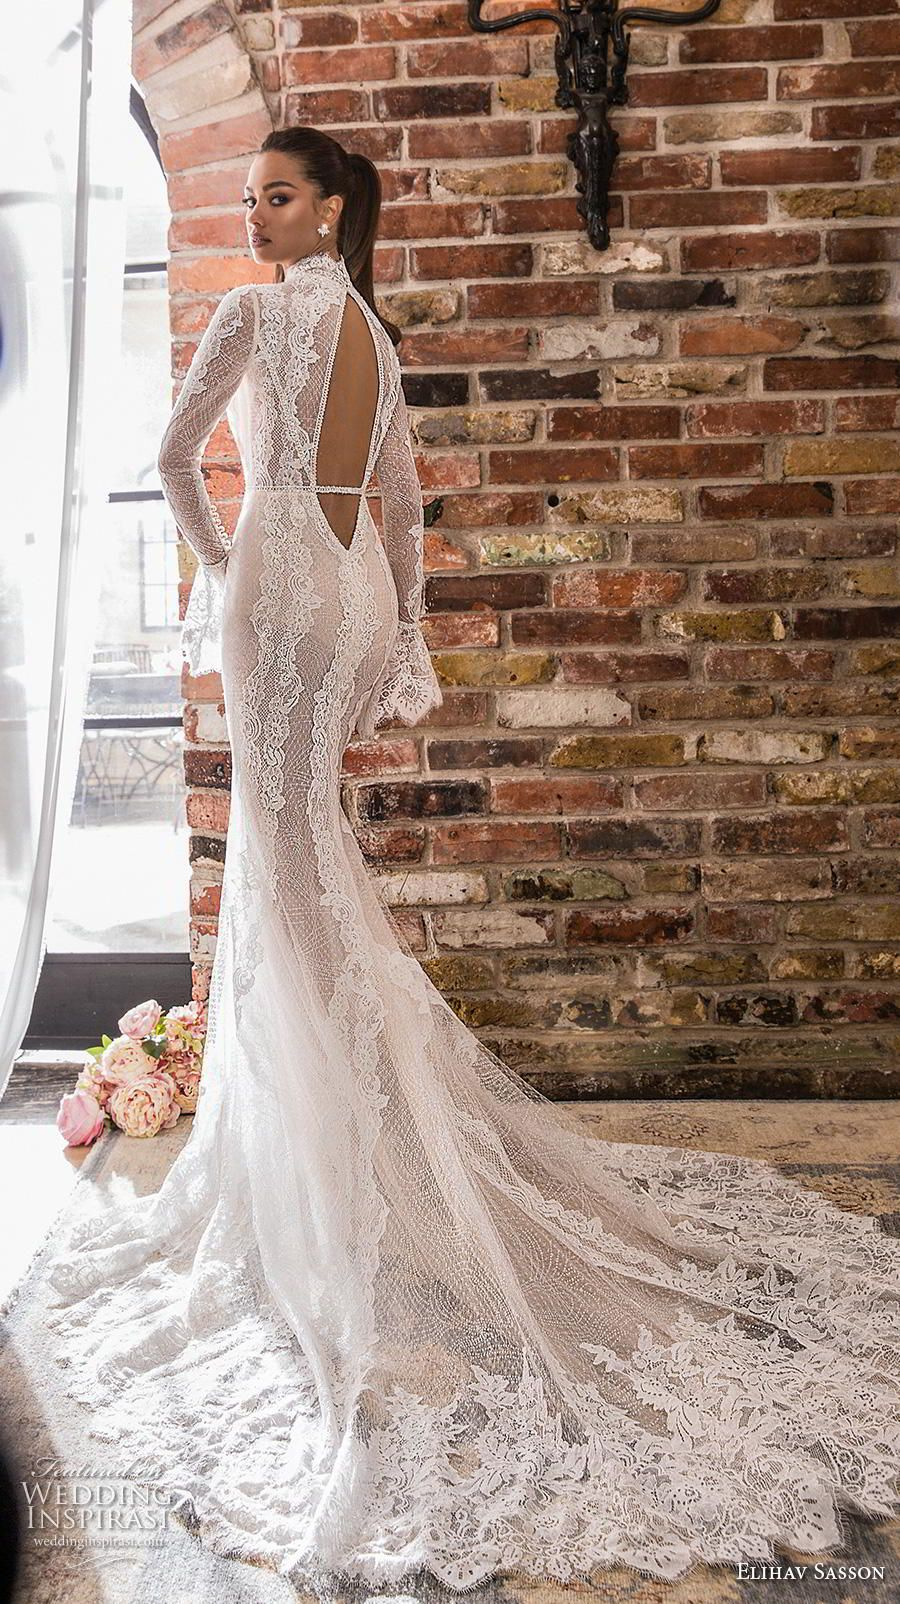 Elihav sasson wedding dresses f gowns pinterest wedding